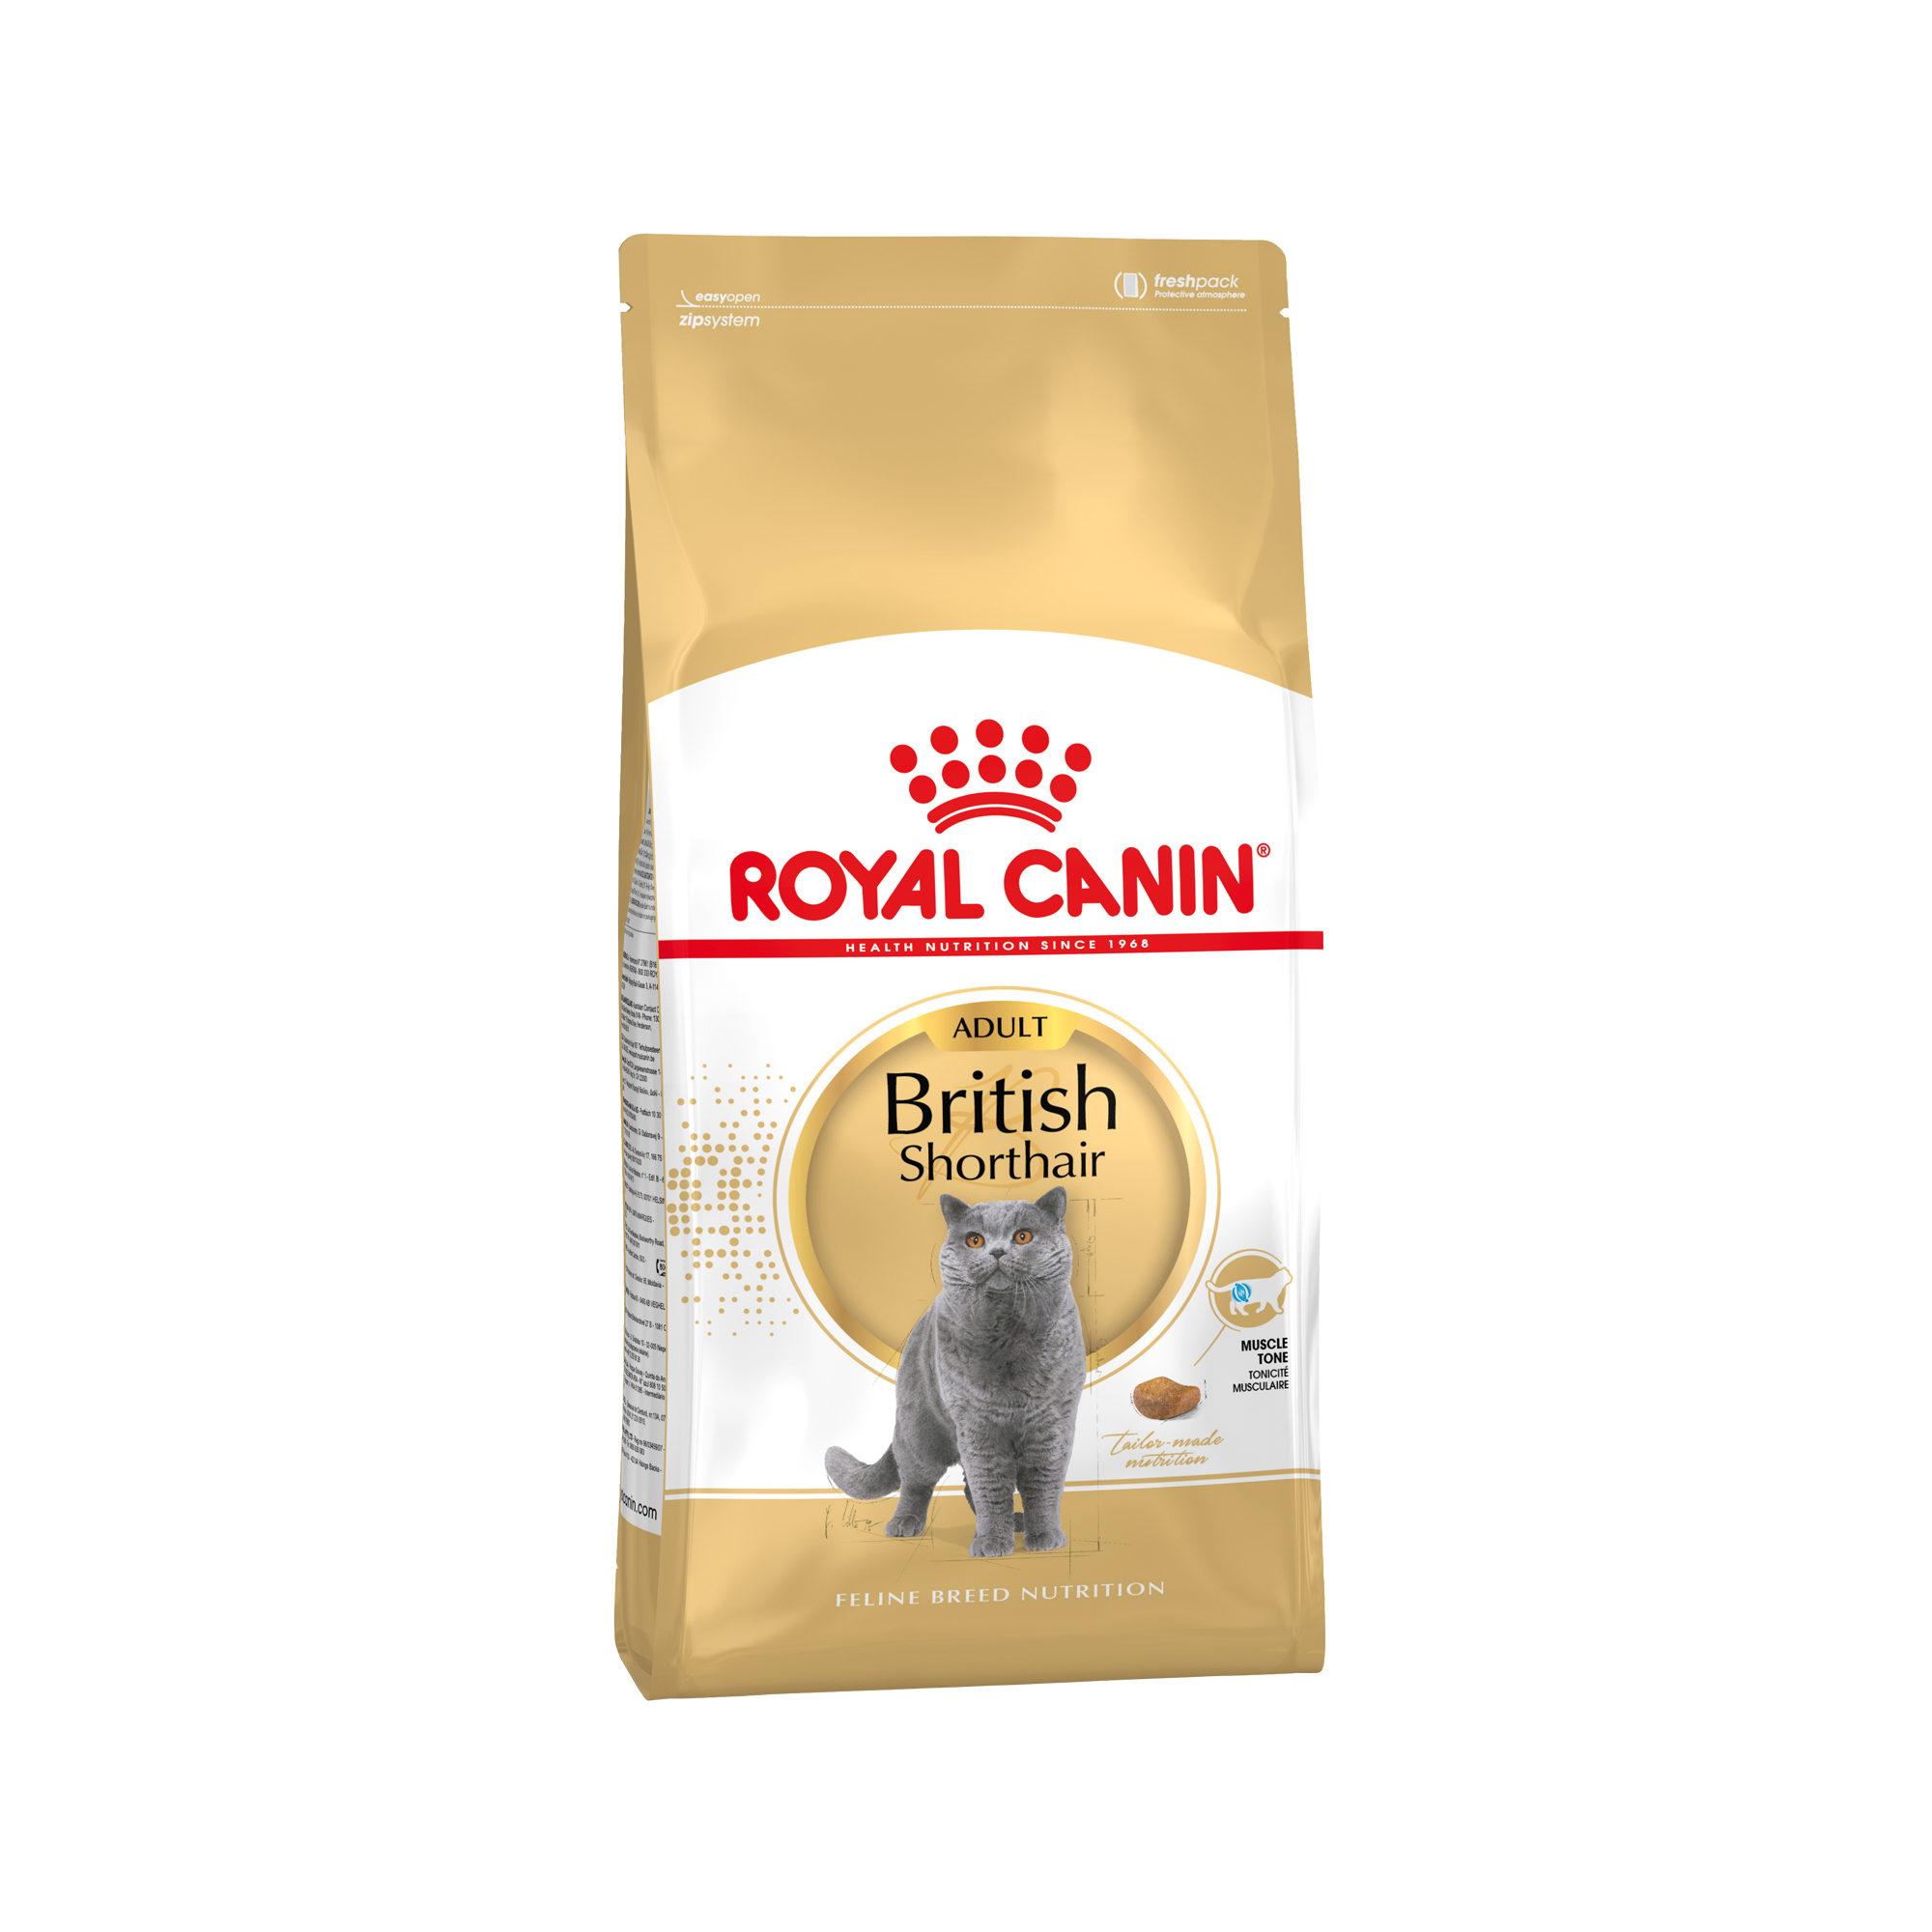 Royal Canin British Shorthair Adult Katzenfutter